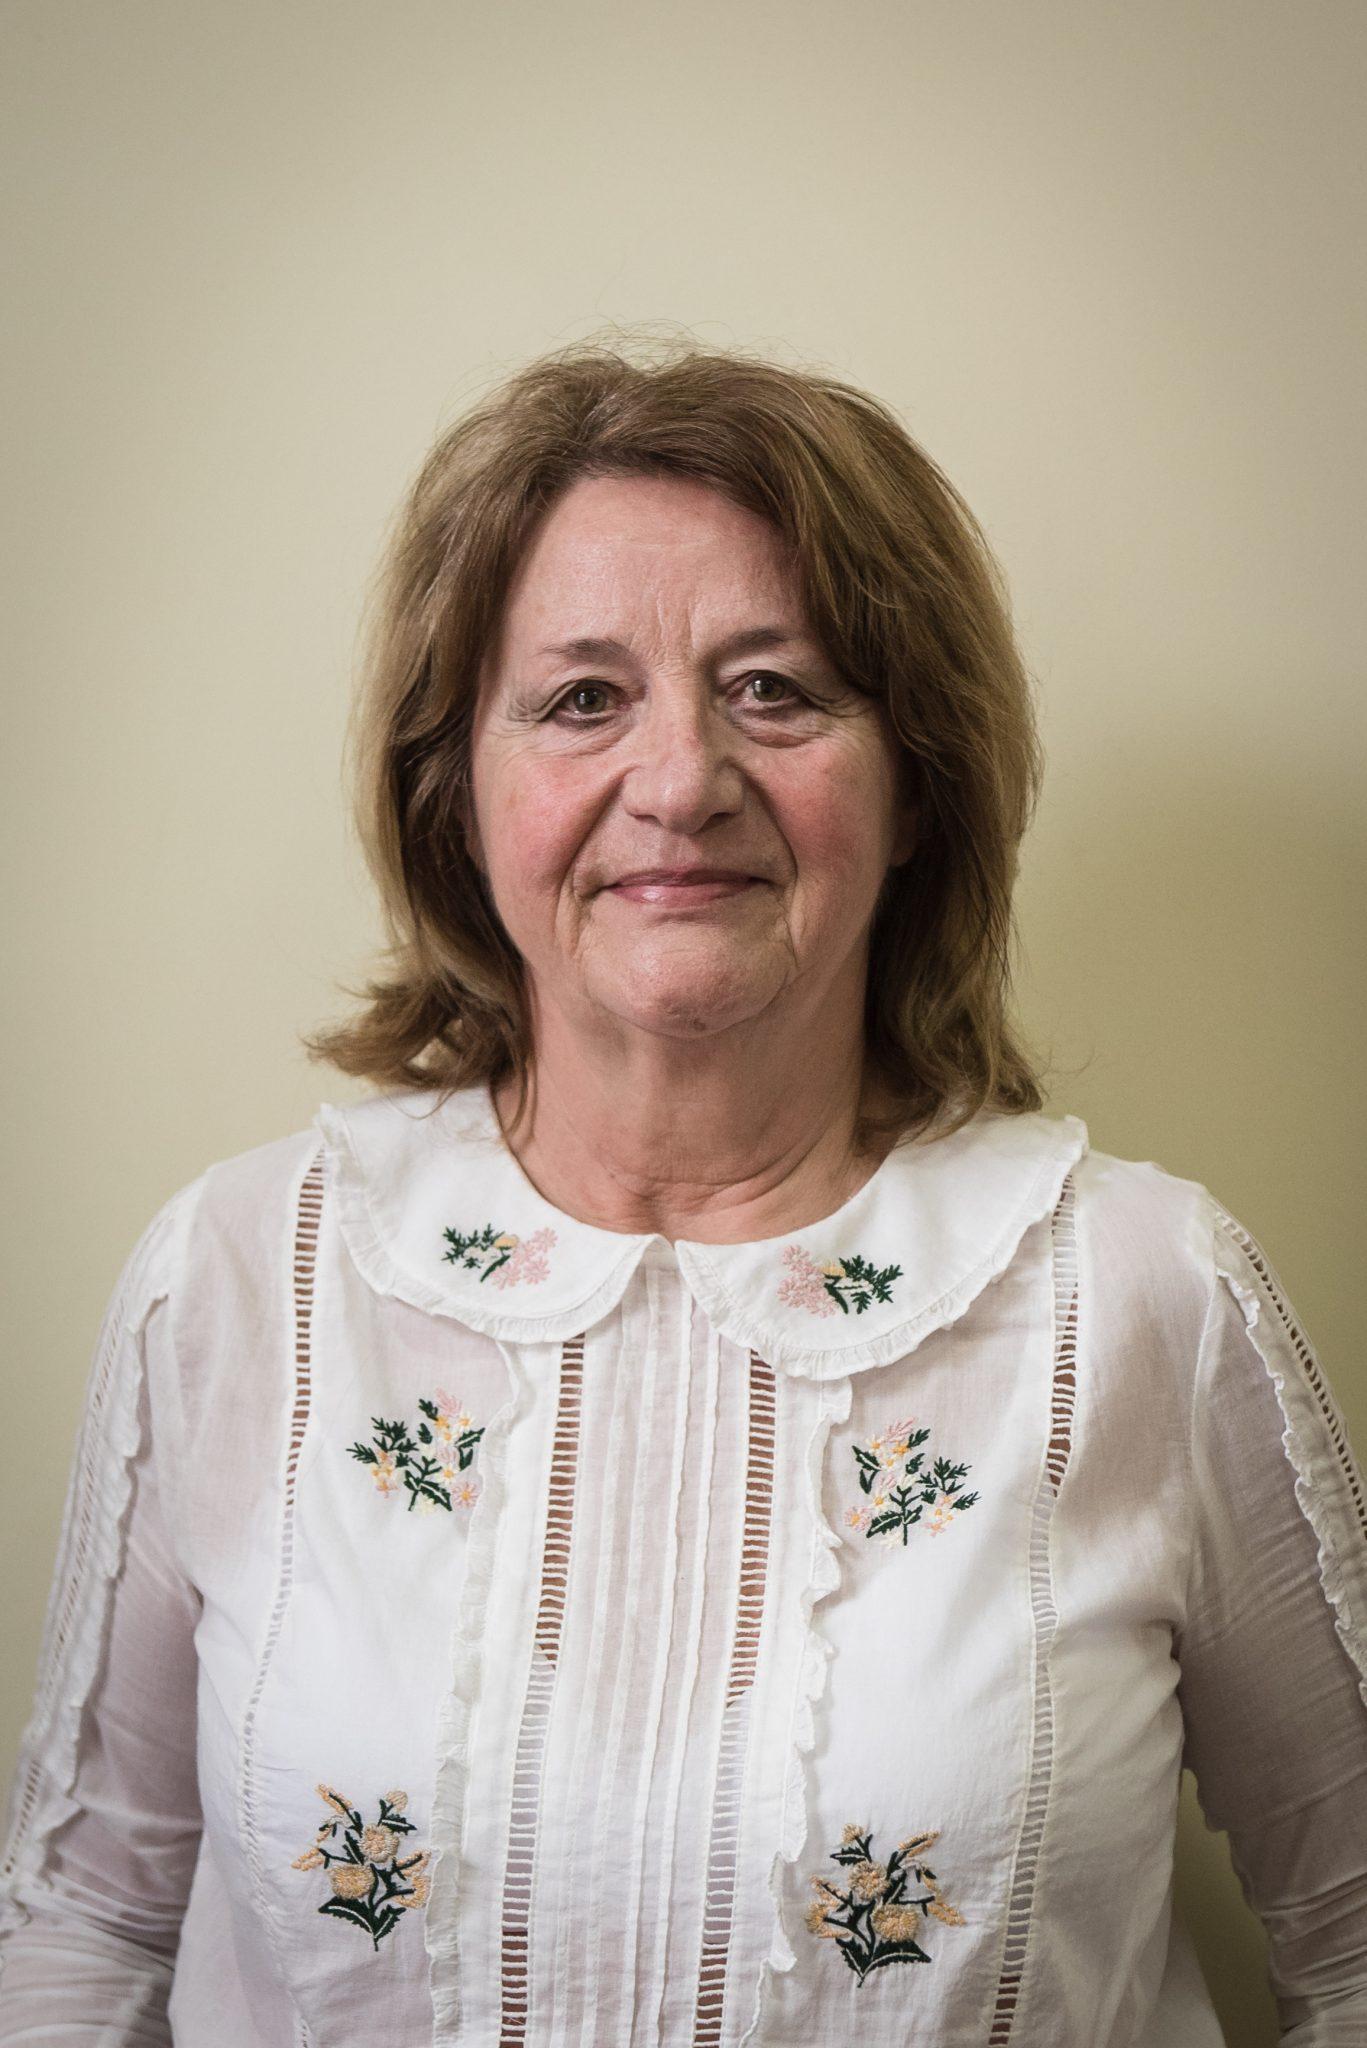 Prof. univ. dr. Liana Pop